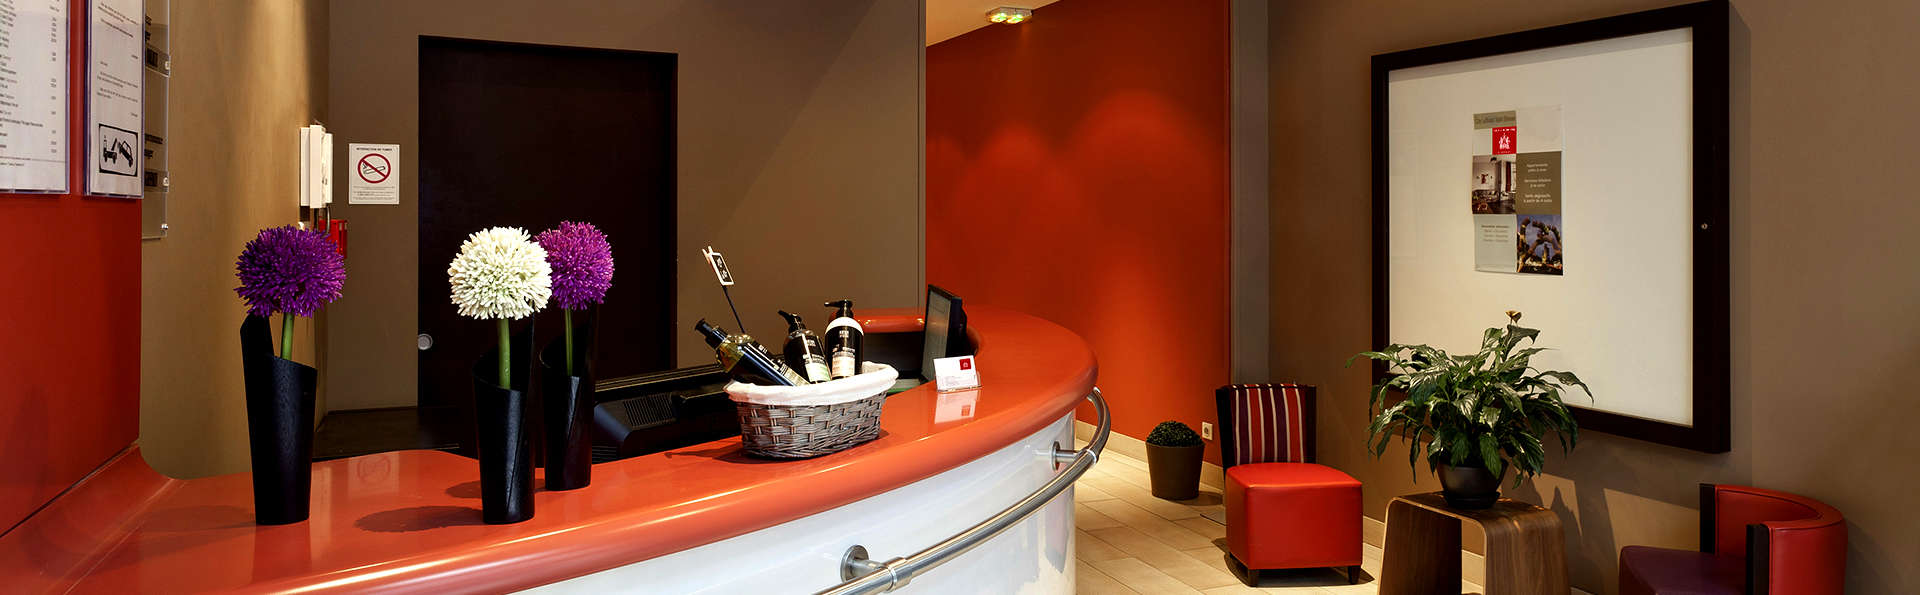 City Lofthotel Saint-Etienne - Edit_Reception.jpg